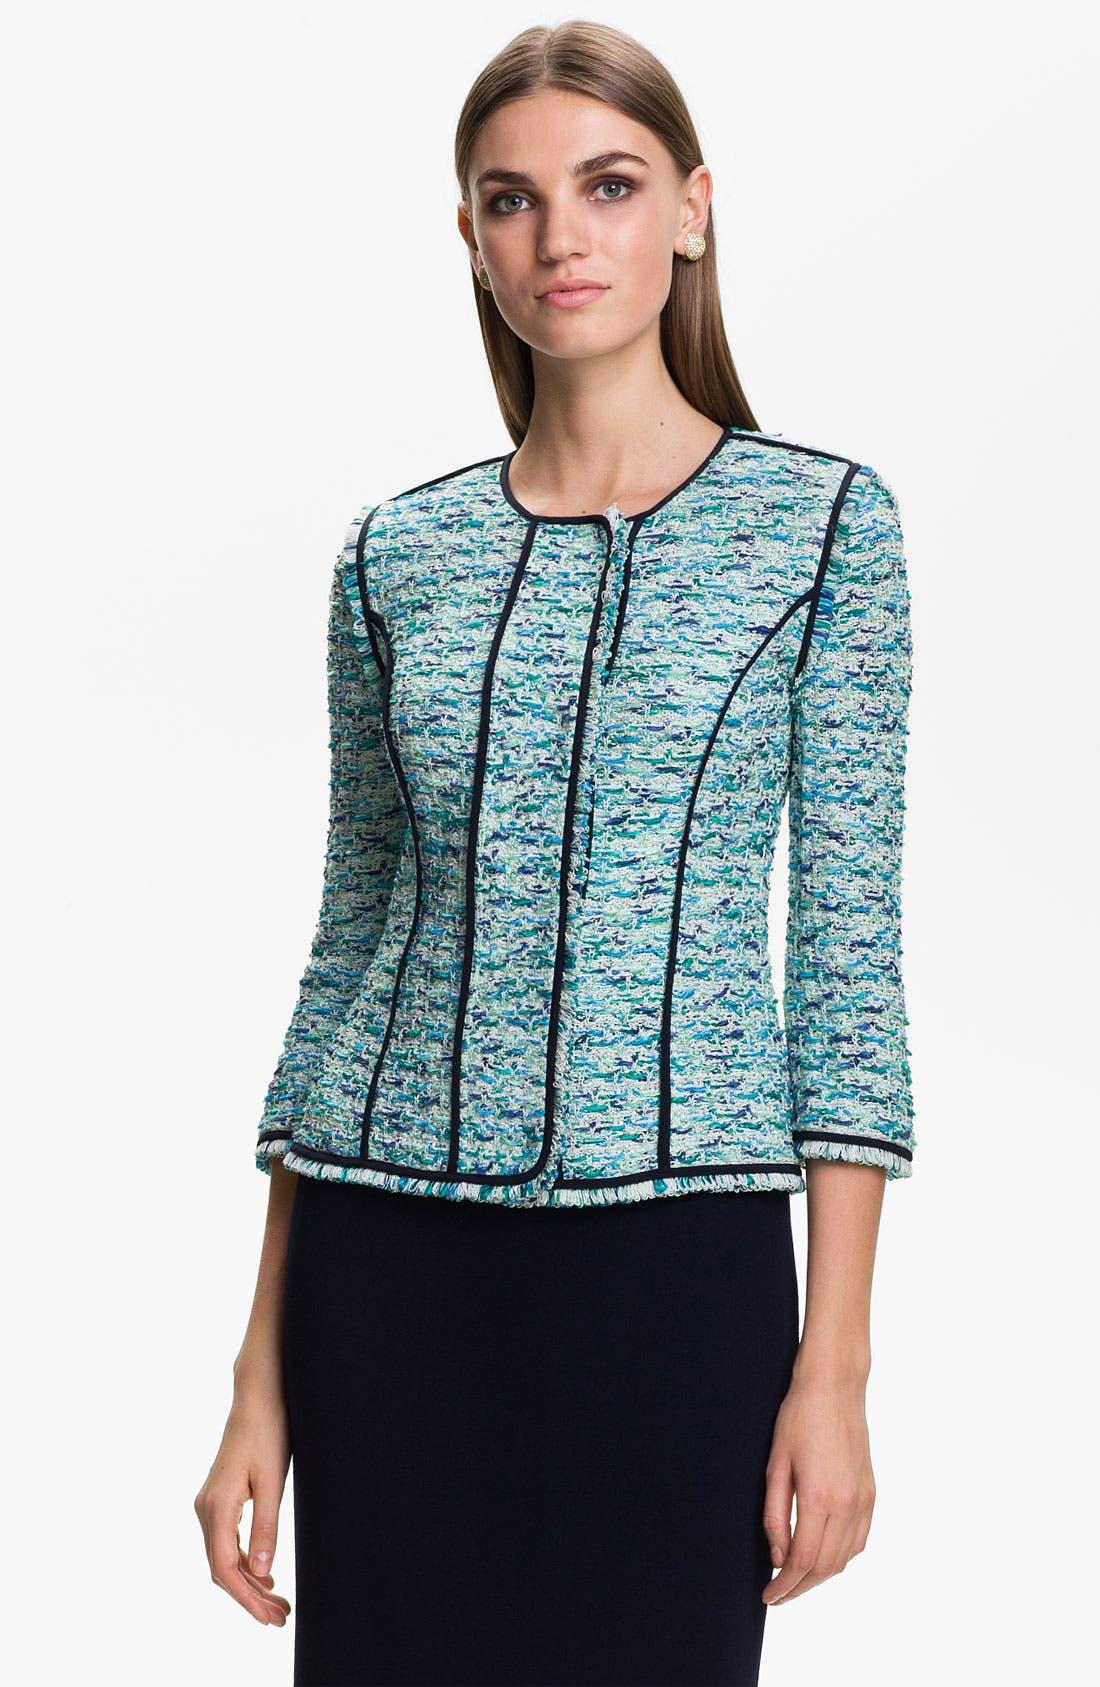 Alternate Image 1 Selected - St. John Collection 'Valmer' Tweed Jacket